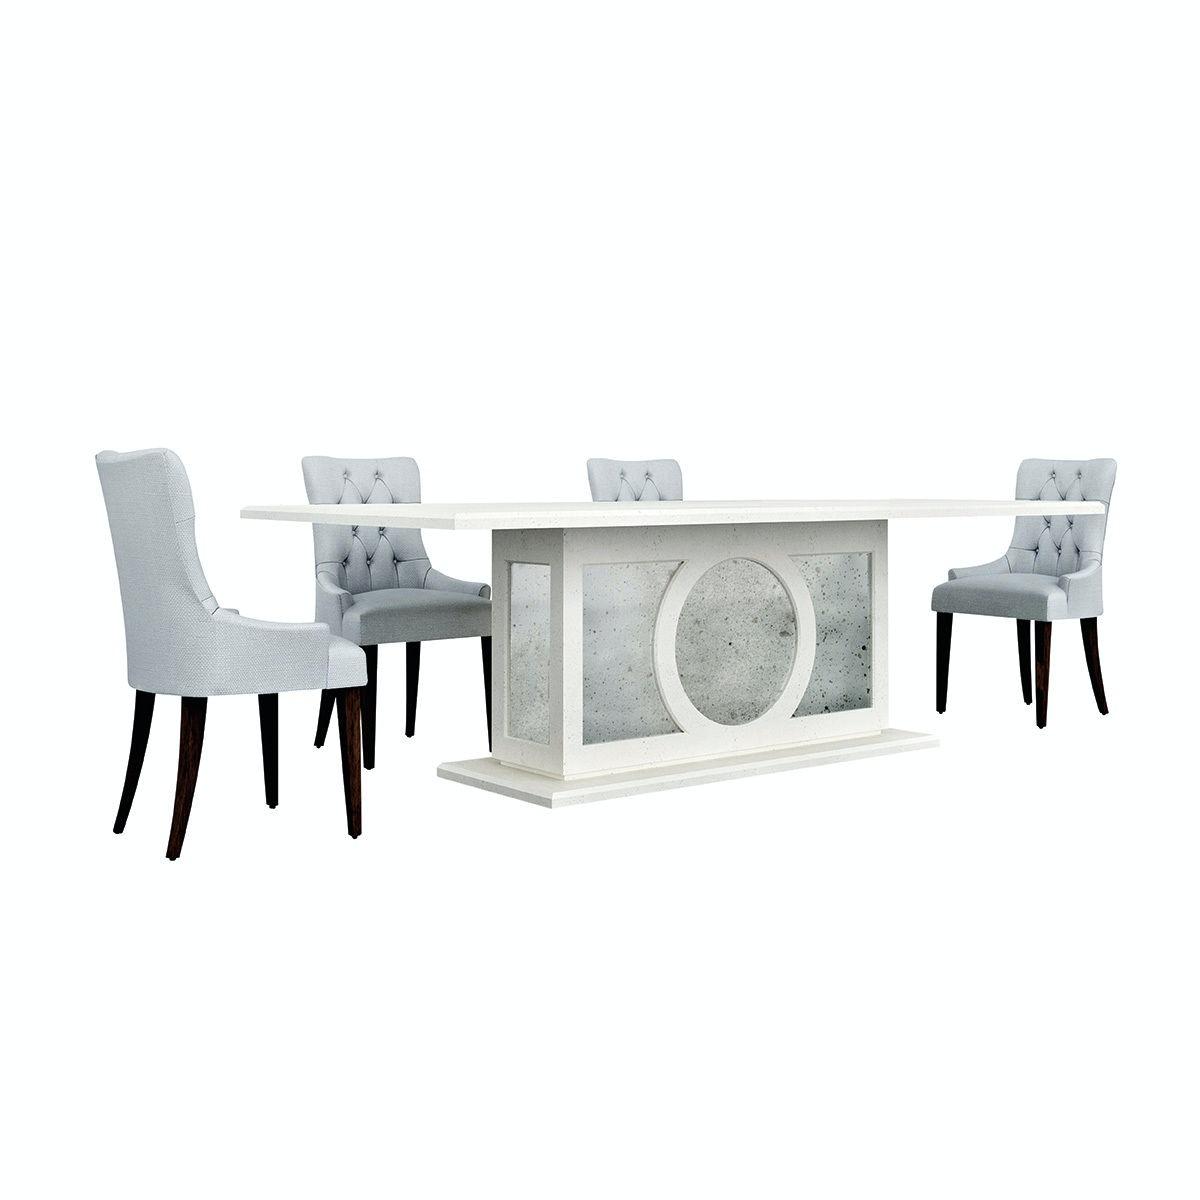 Habersham Plantation Corporation Chelsea Glass Top Dining Table 03 3729 G